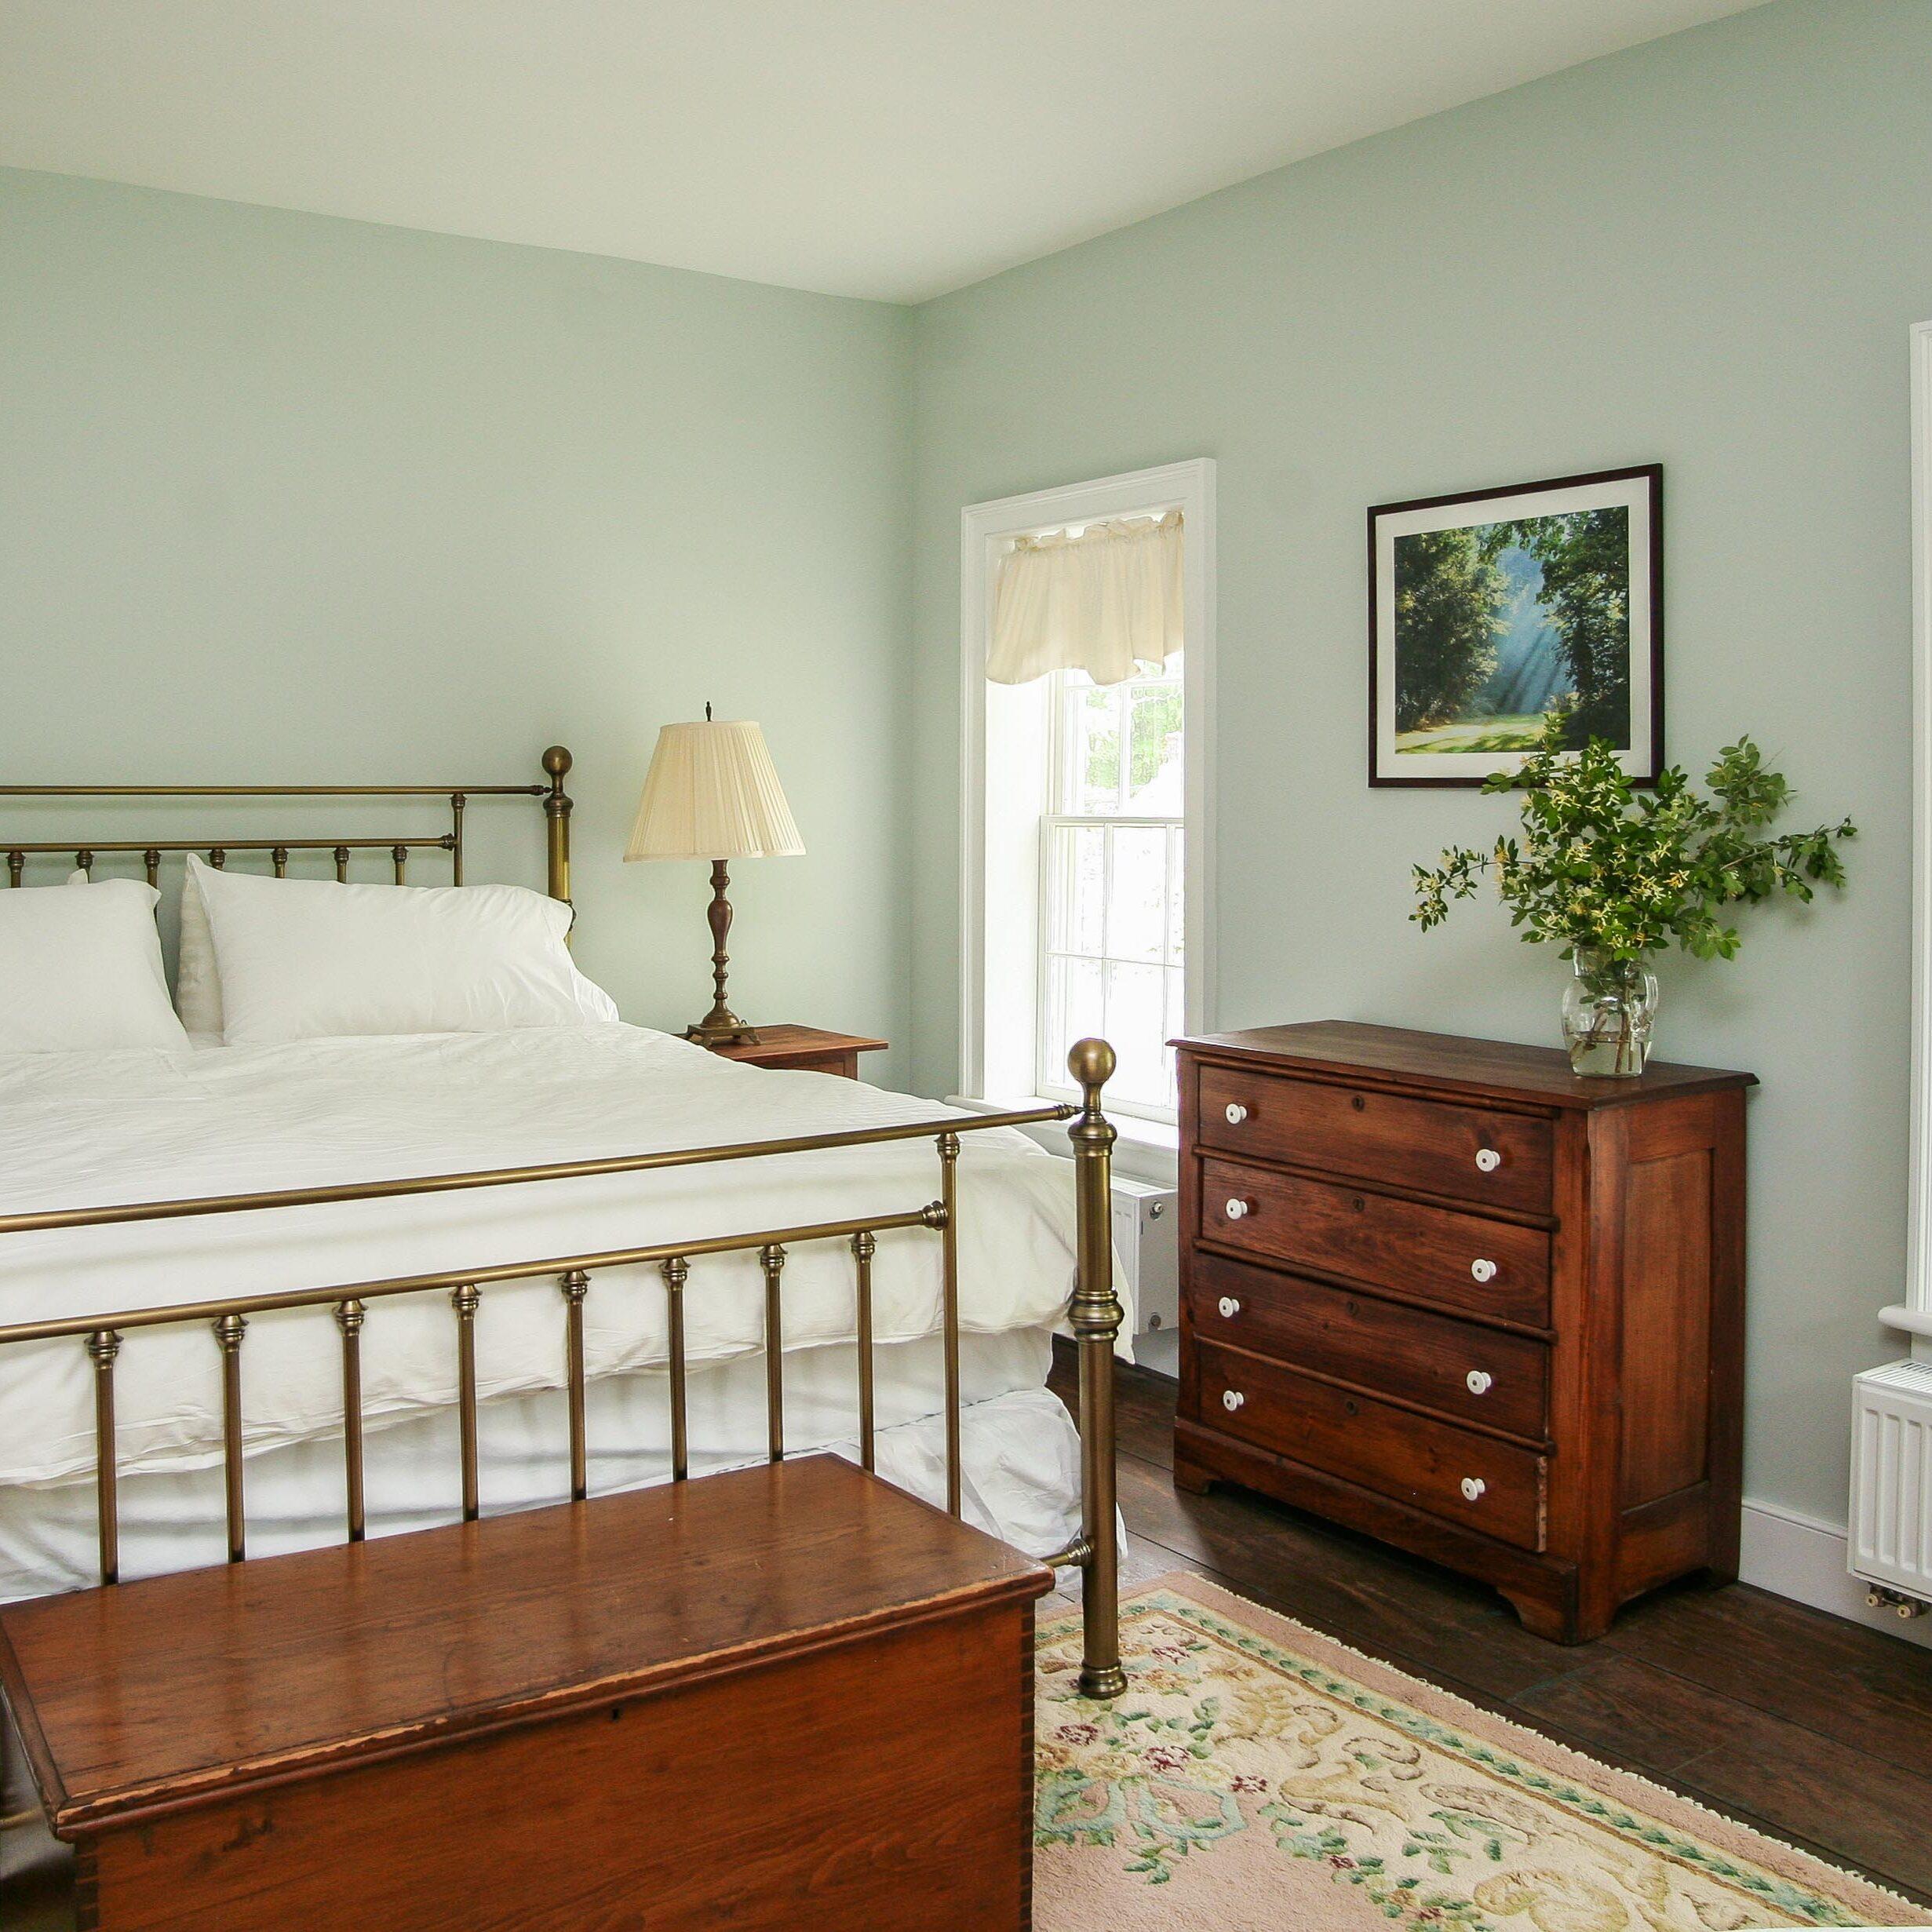 Van Volkenburgh Room at the New Concord Bed & Breakfast